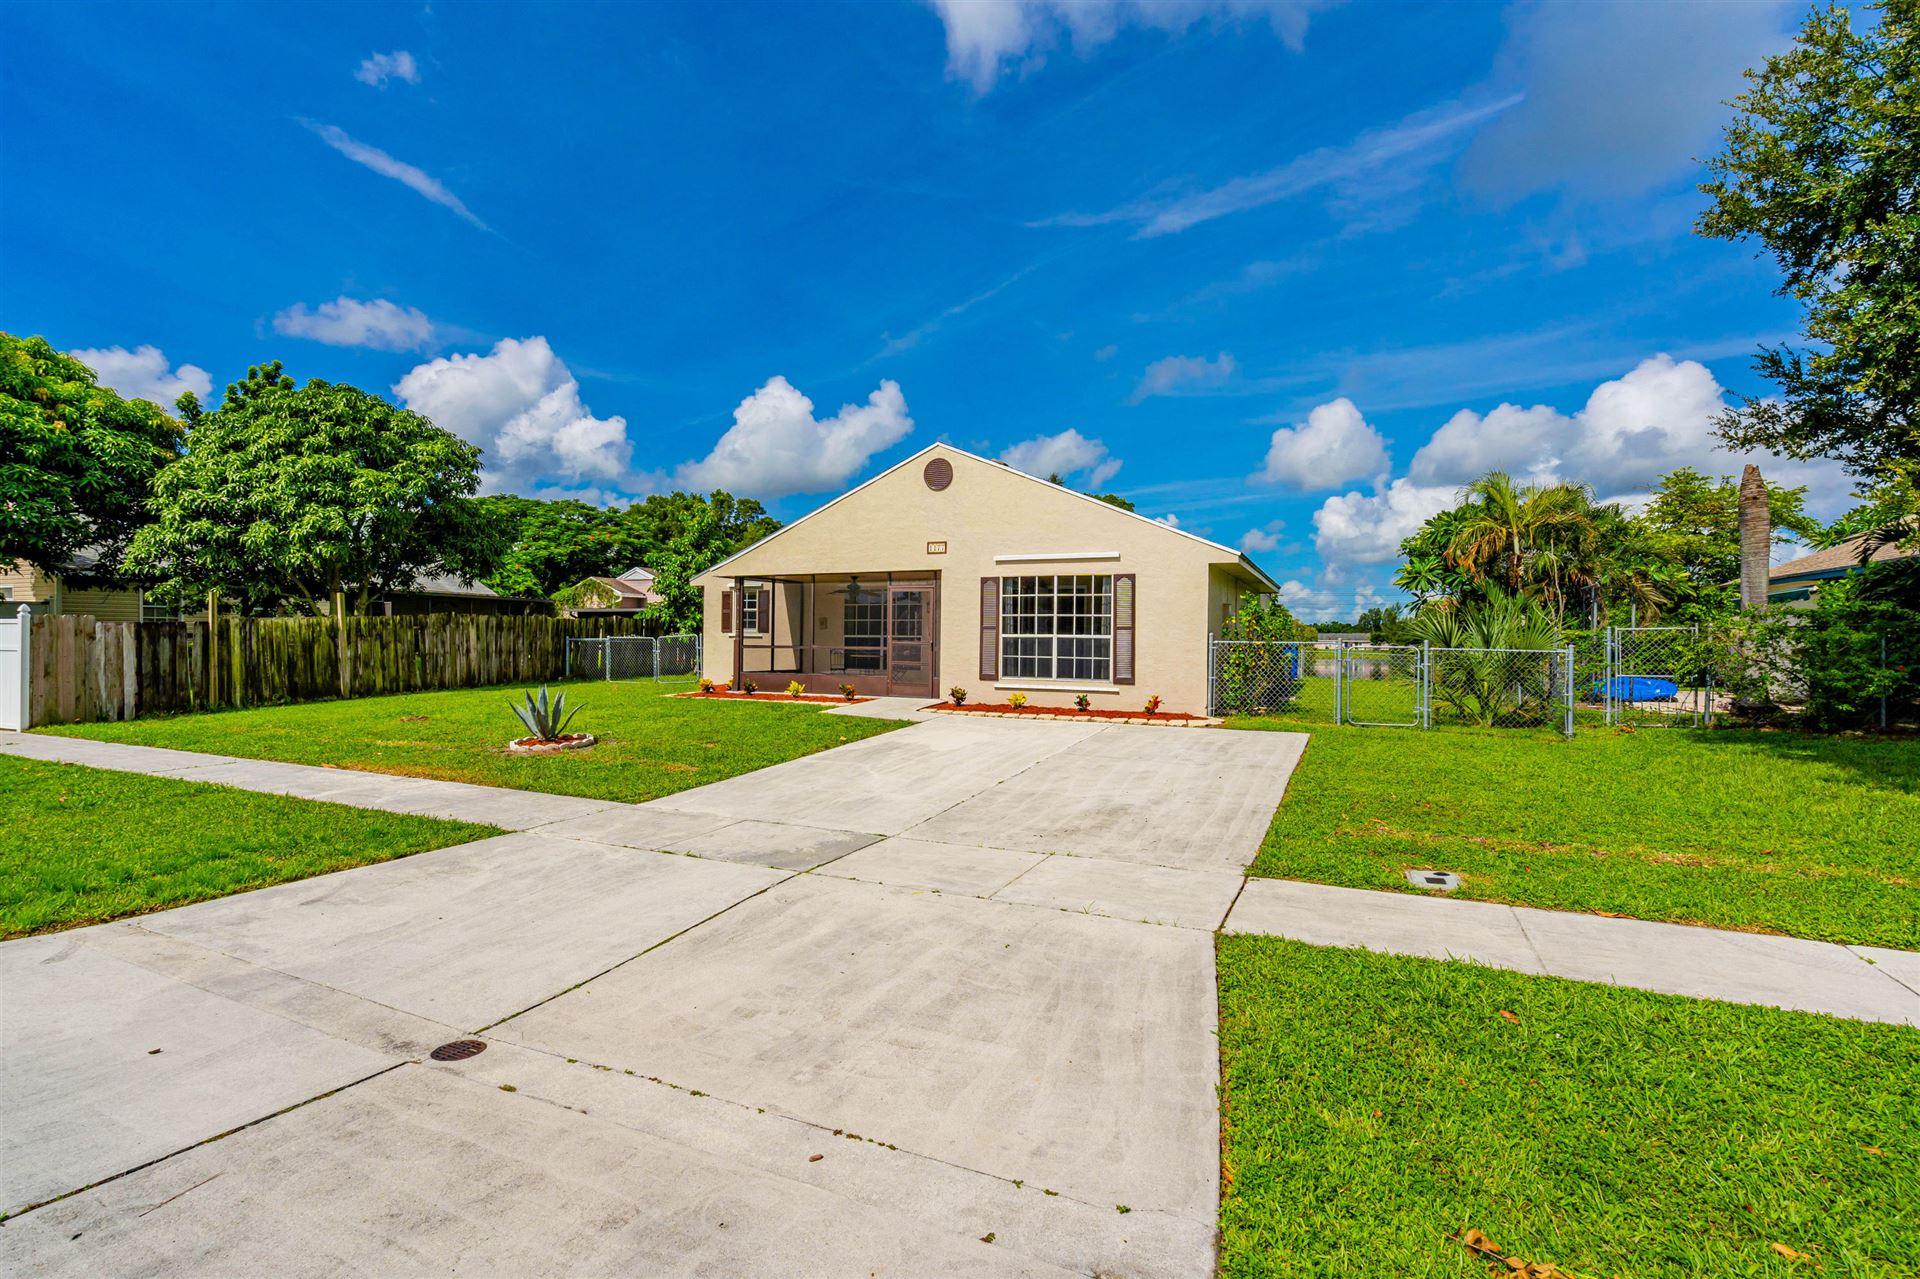 1177 Grandview Circle, Royal Palm Beach, FL 33411 - #: RX-10650520